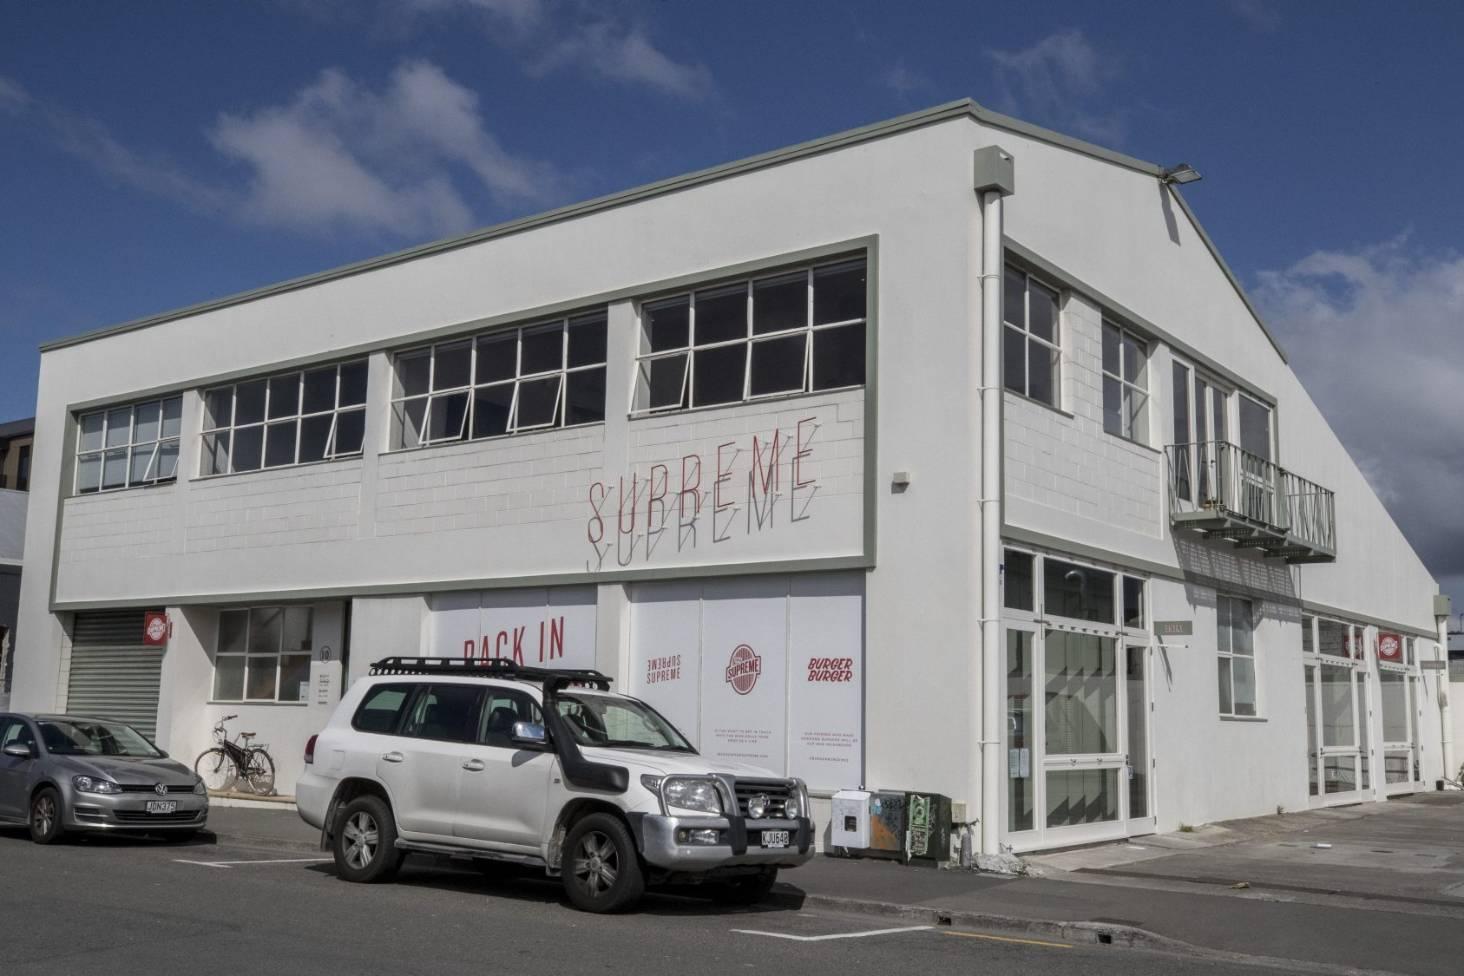 Burger Burger on its way to Christchurch as Supreme Supreme